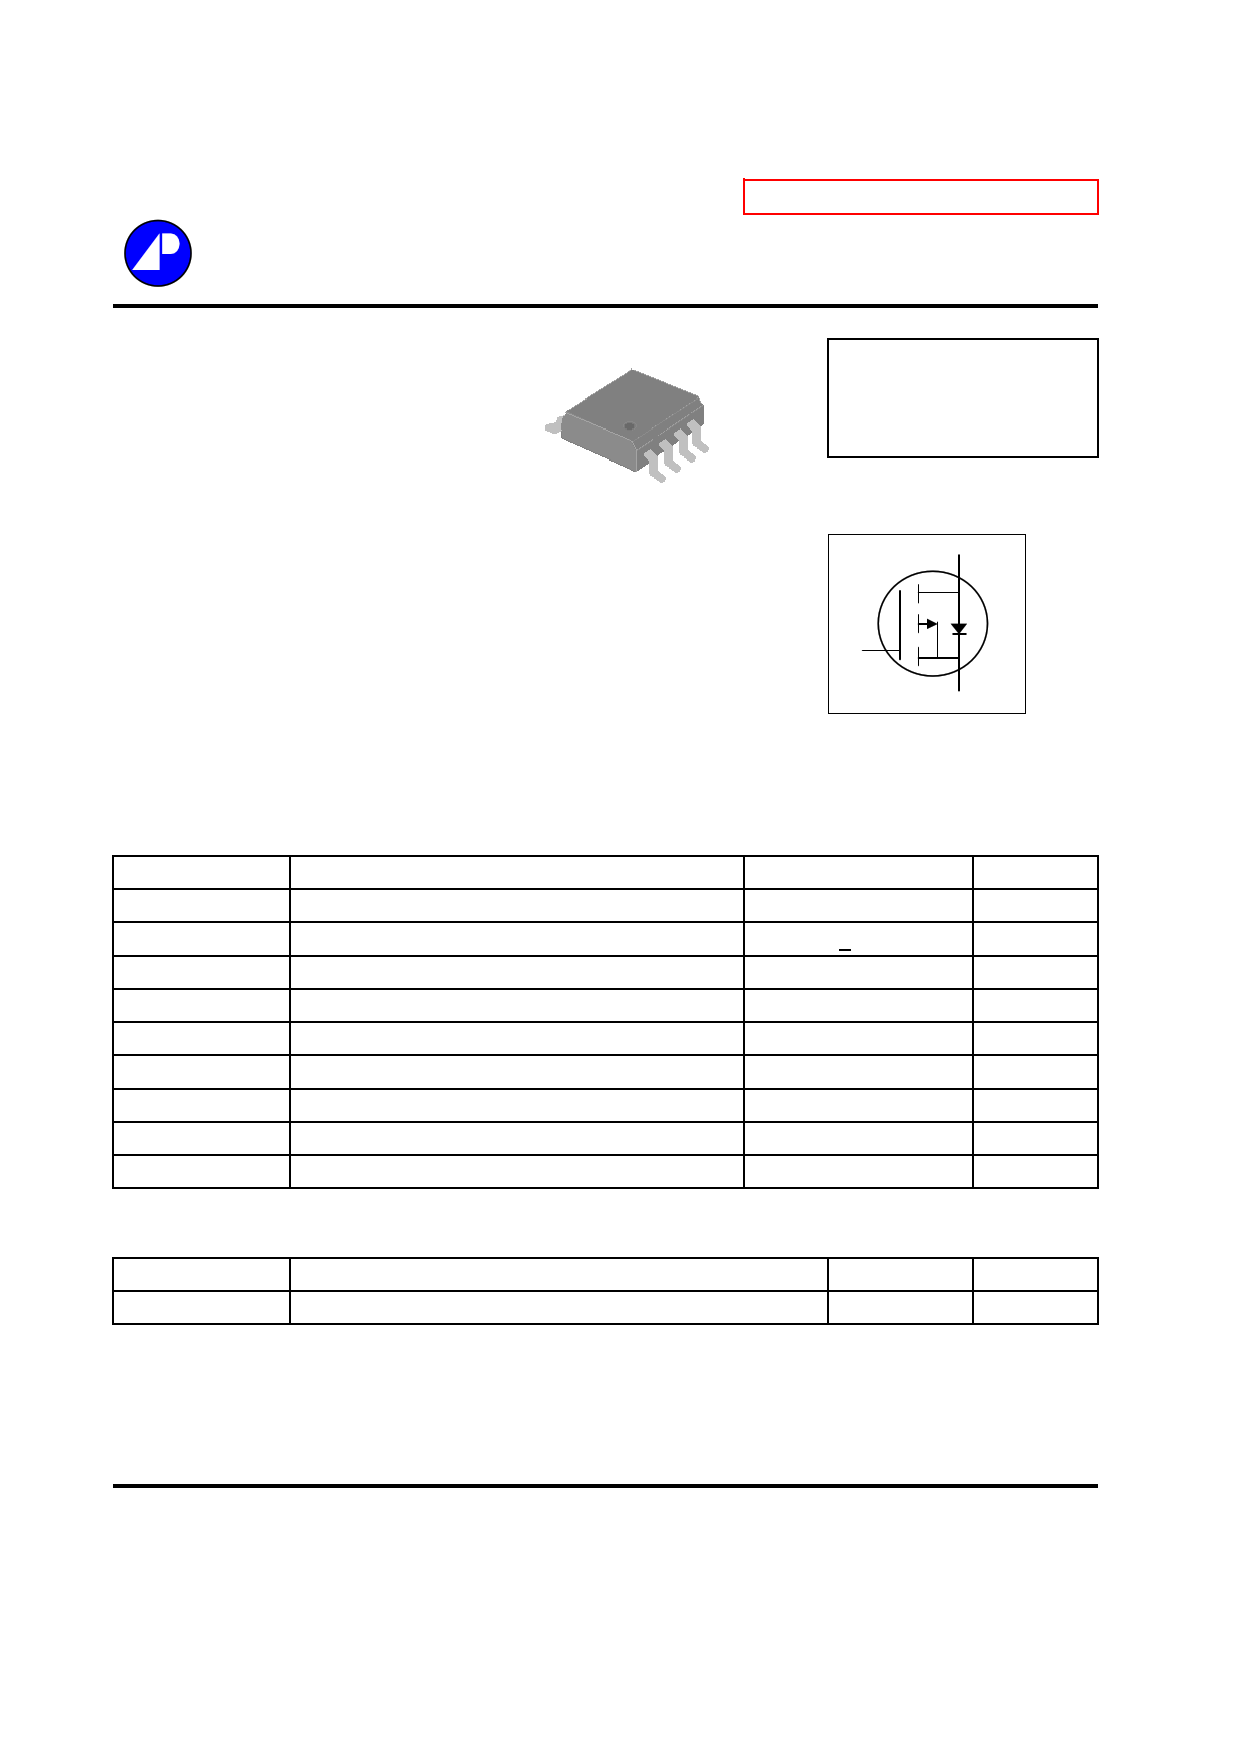 4435GM-HF Даташит, Описание, Даташиты